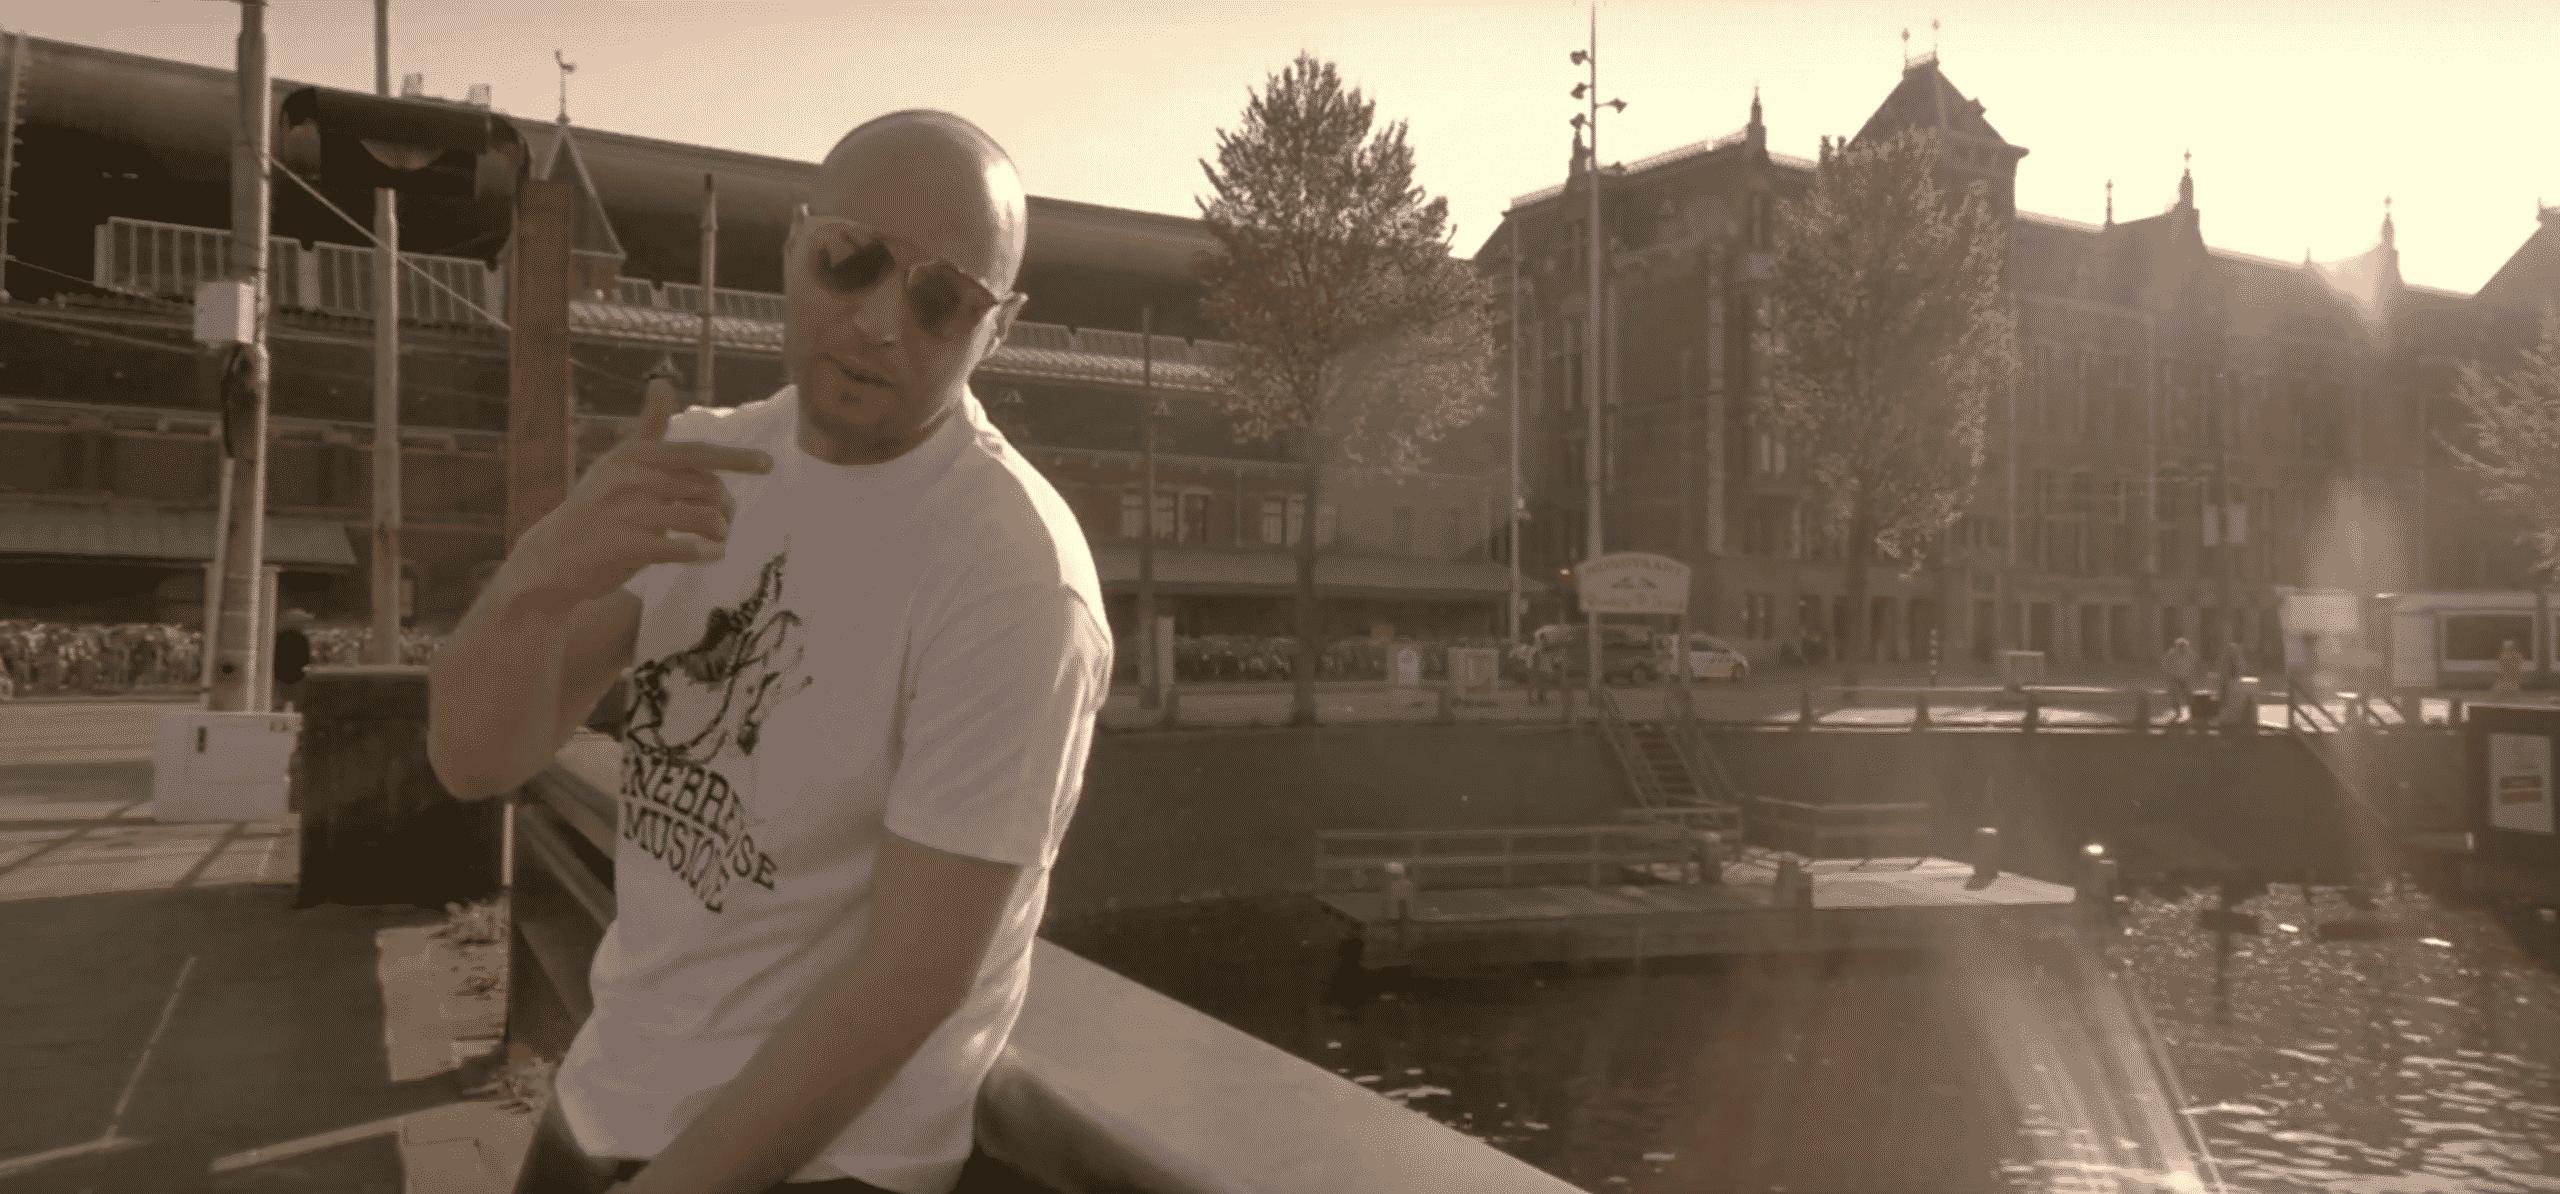 image alkpote clip amsterdam city gang